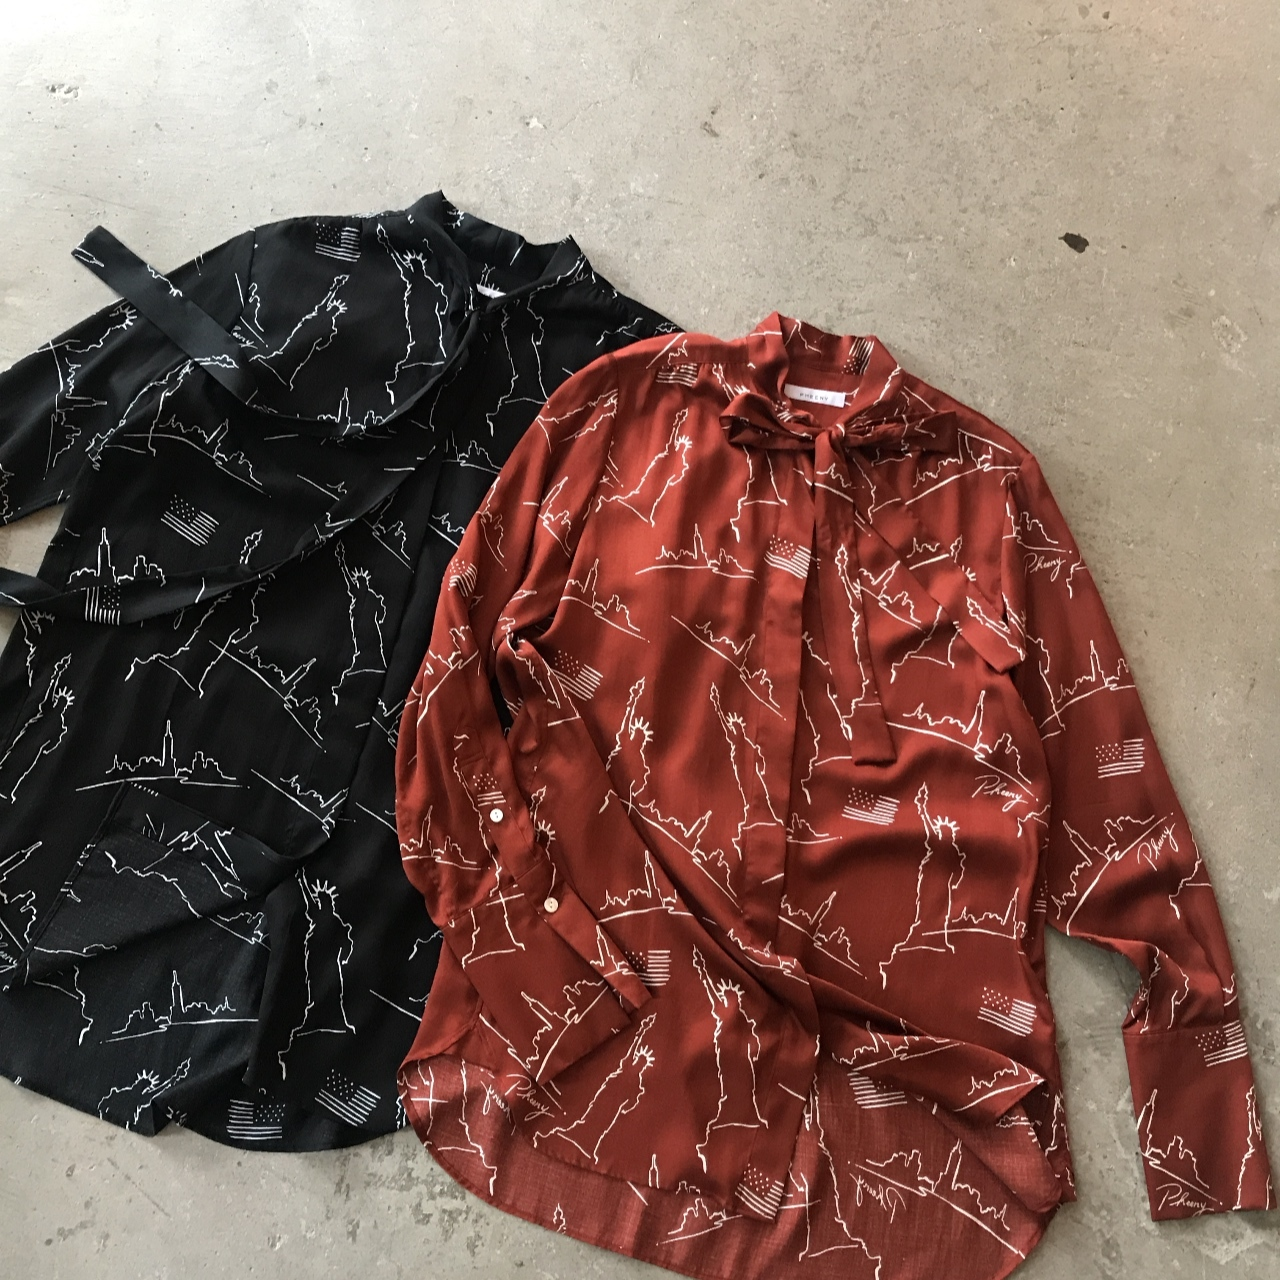 PHEENY - NYC printed bowtie shirt